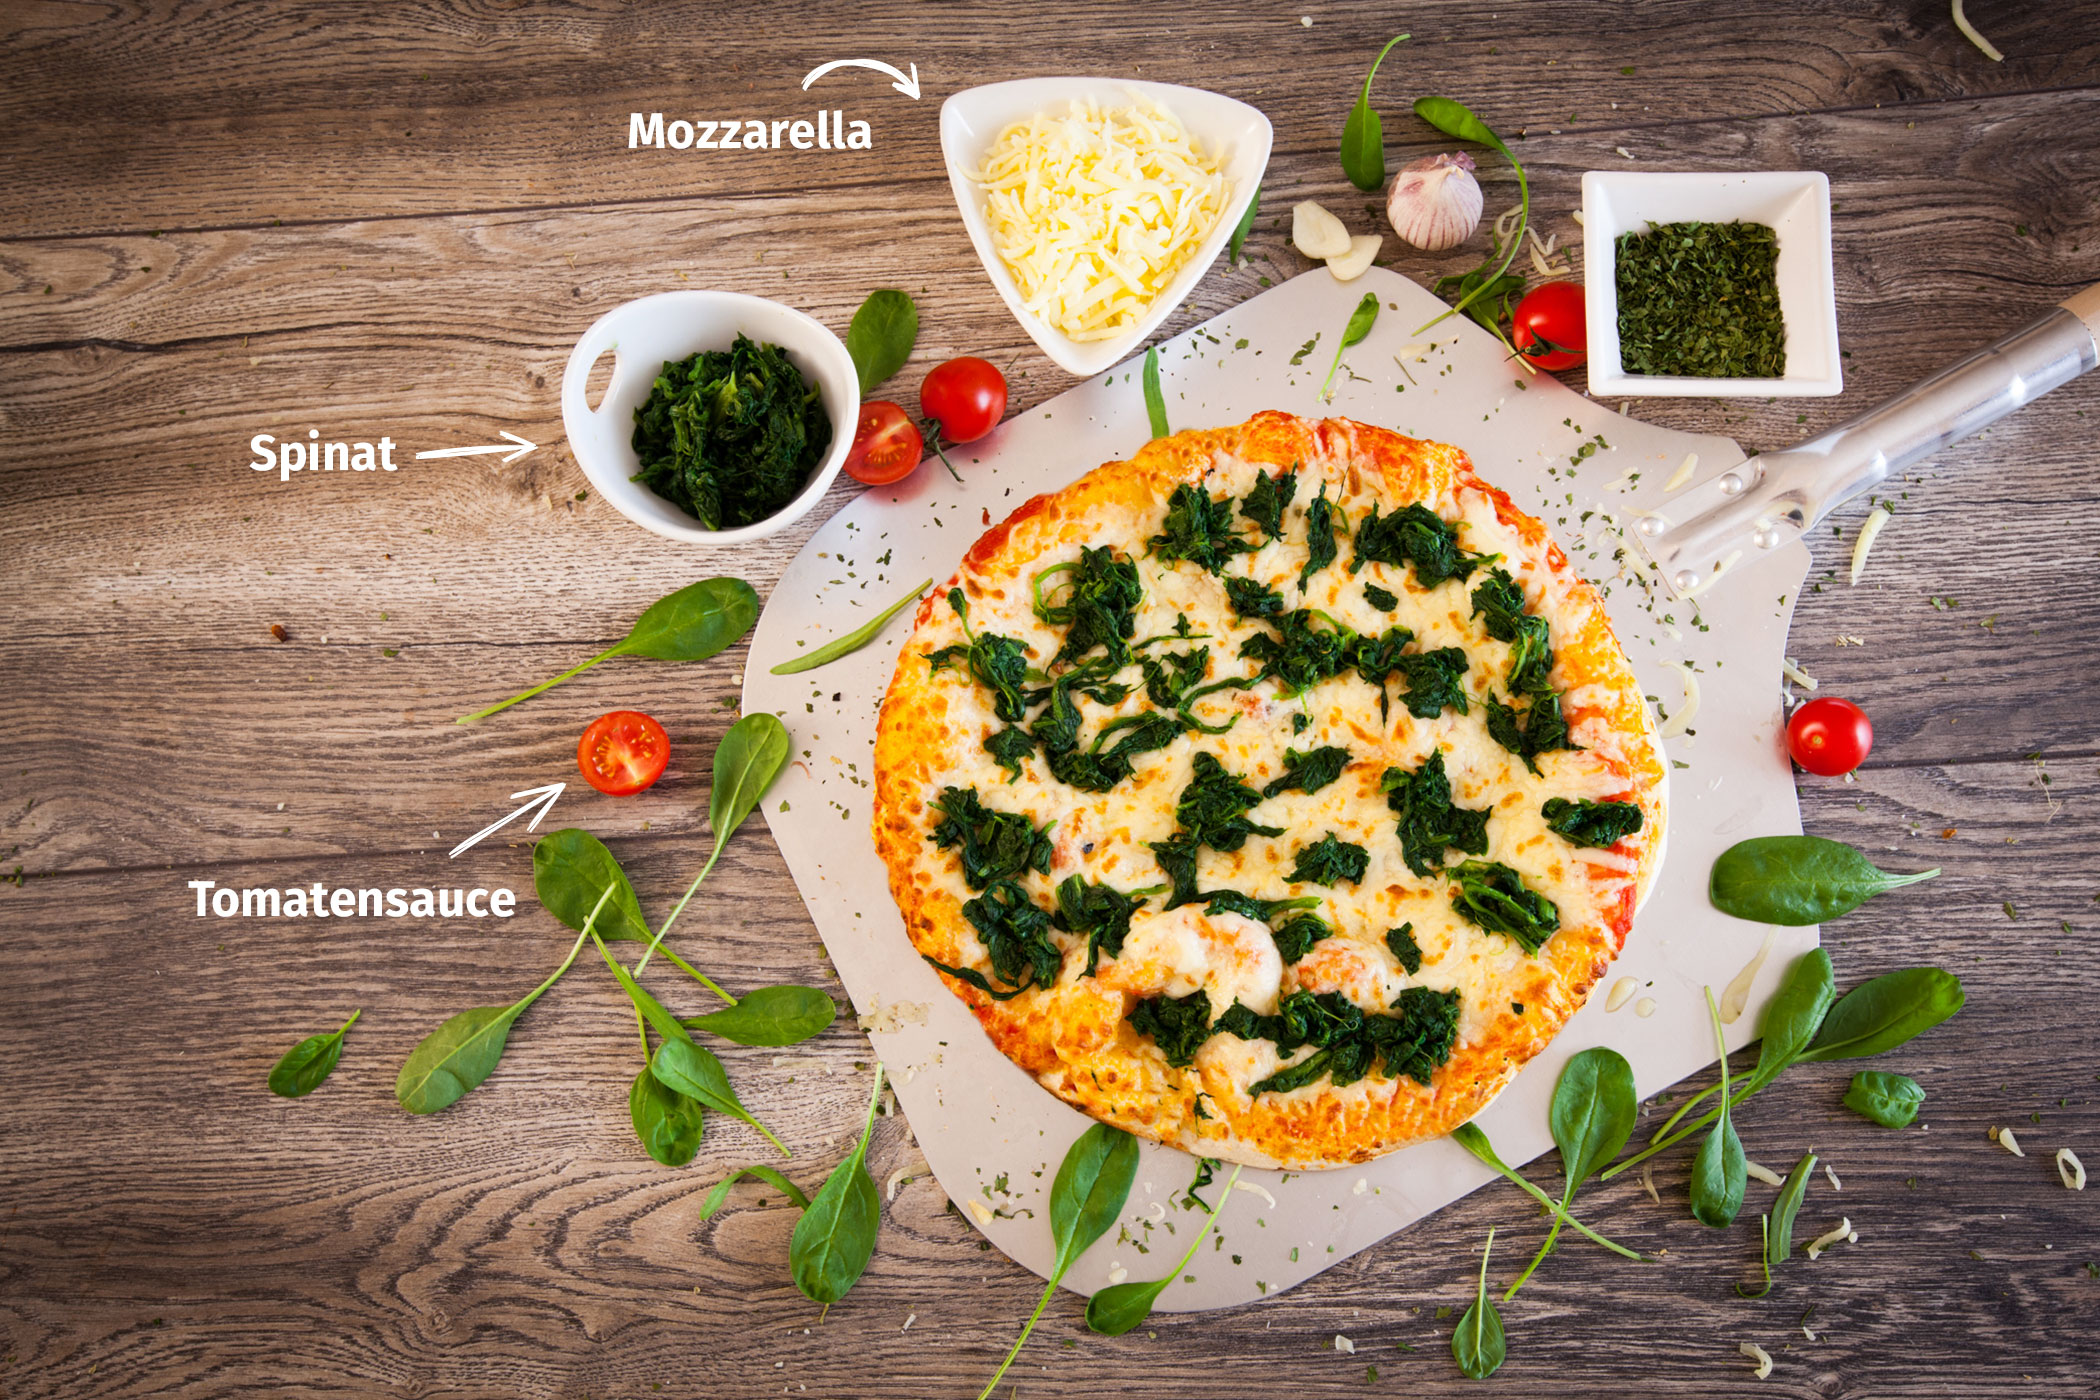 Original Franzesco Pizza Spinat-Mozzarella mit Zutaten